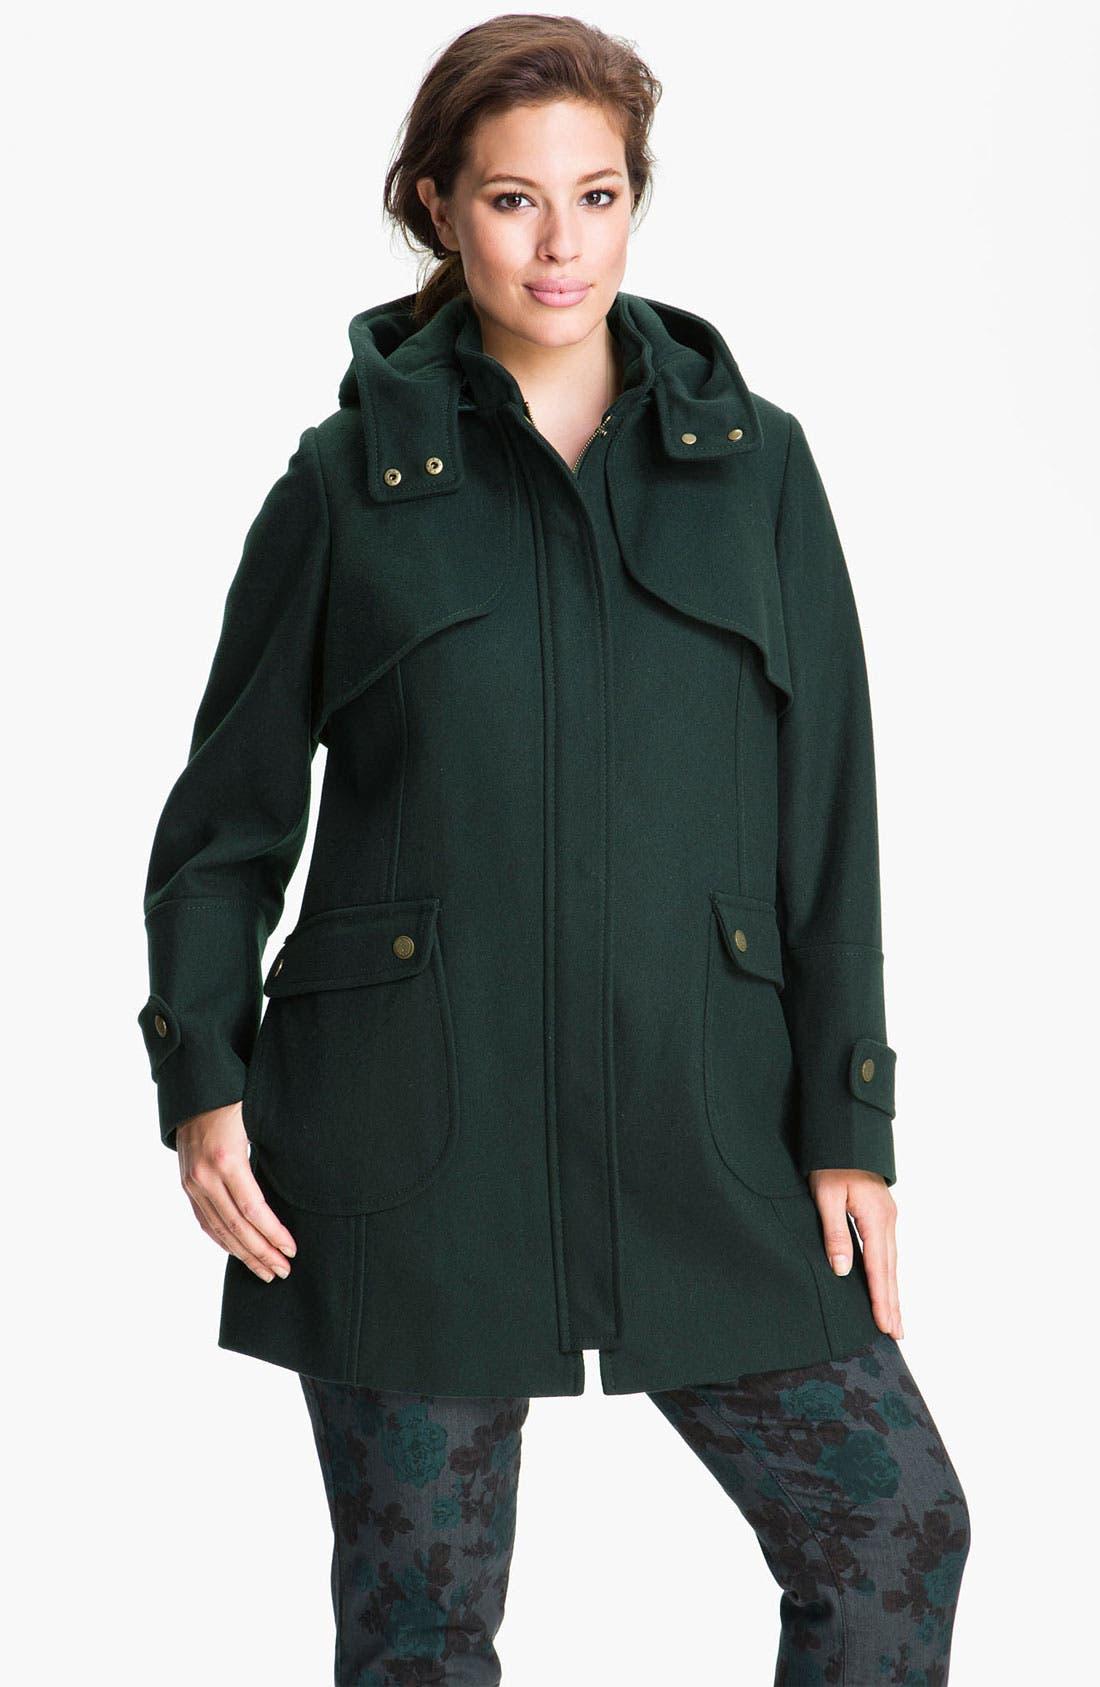 Wool Blend Jacket with Detachable Hood,                             Main thumbnail 1, color,                             300